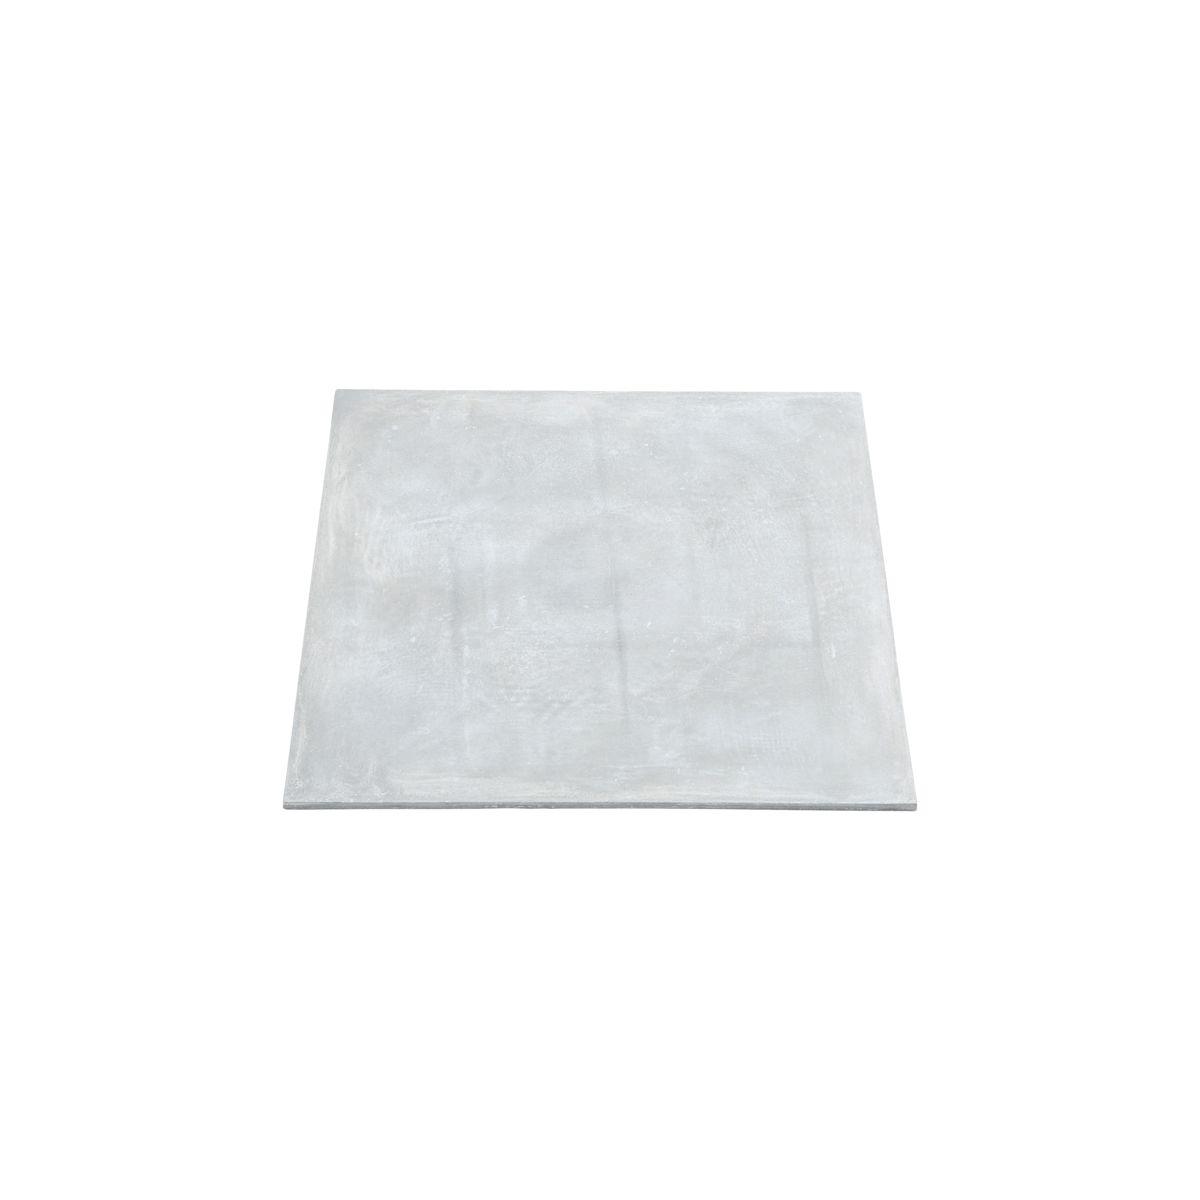 House Doctor, Bordplade beton 60x60 cm